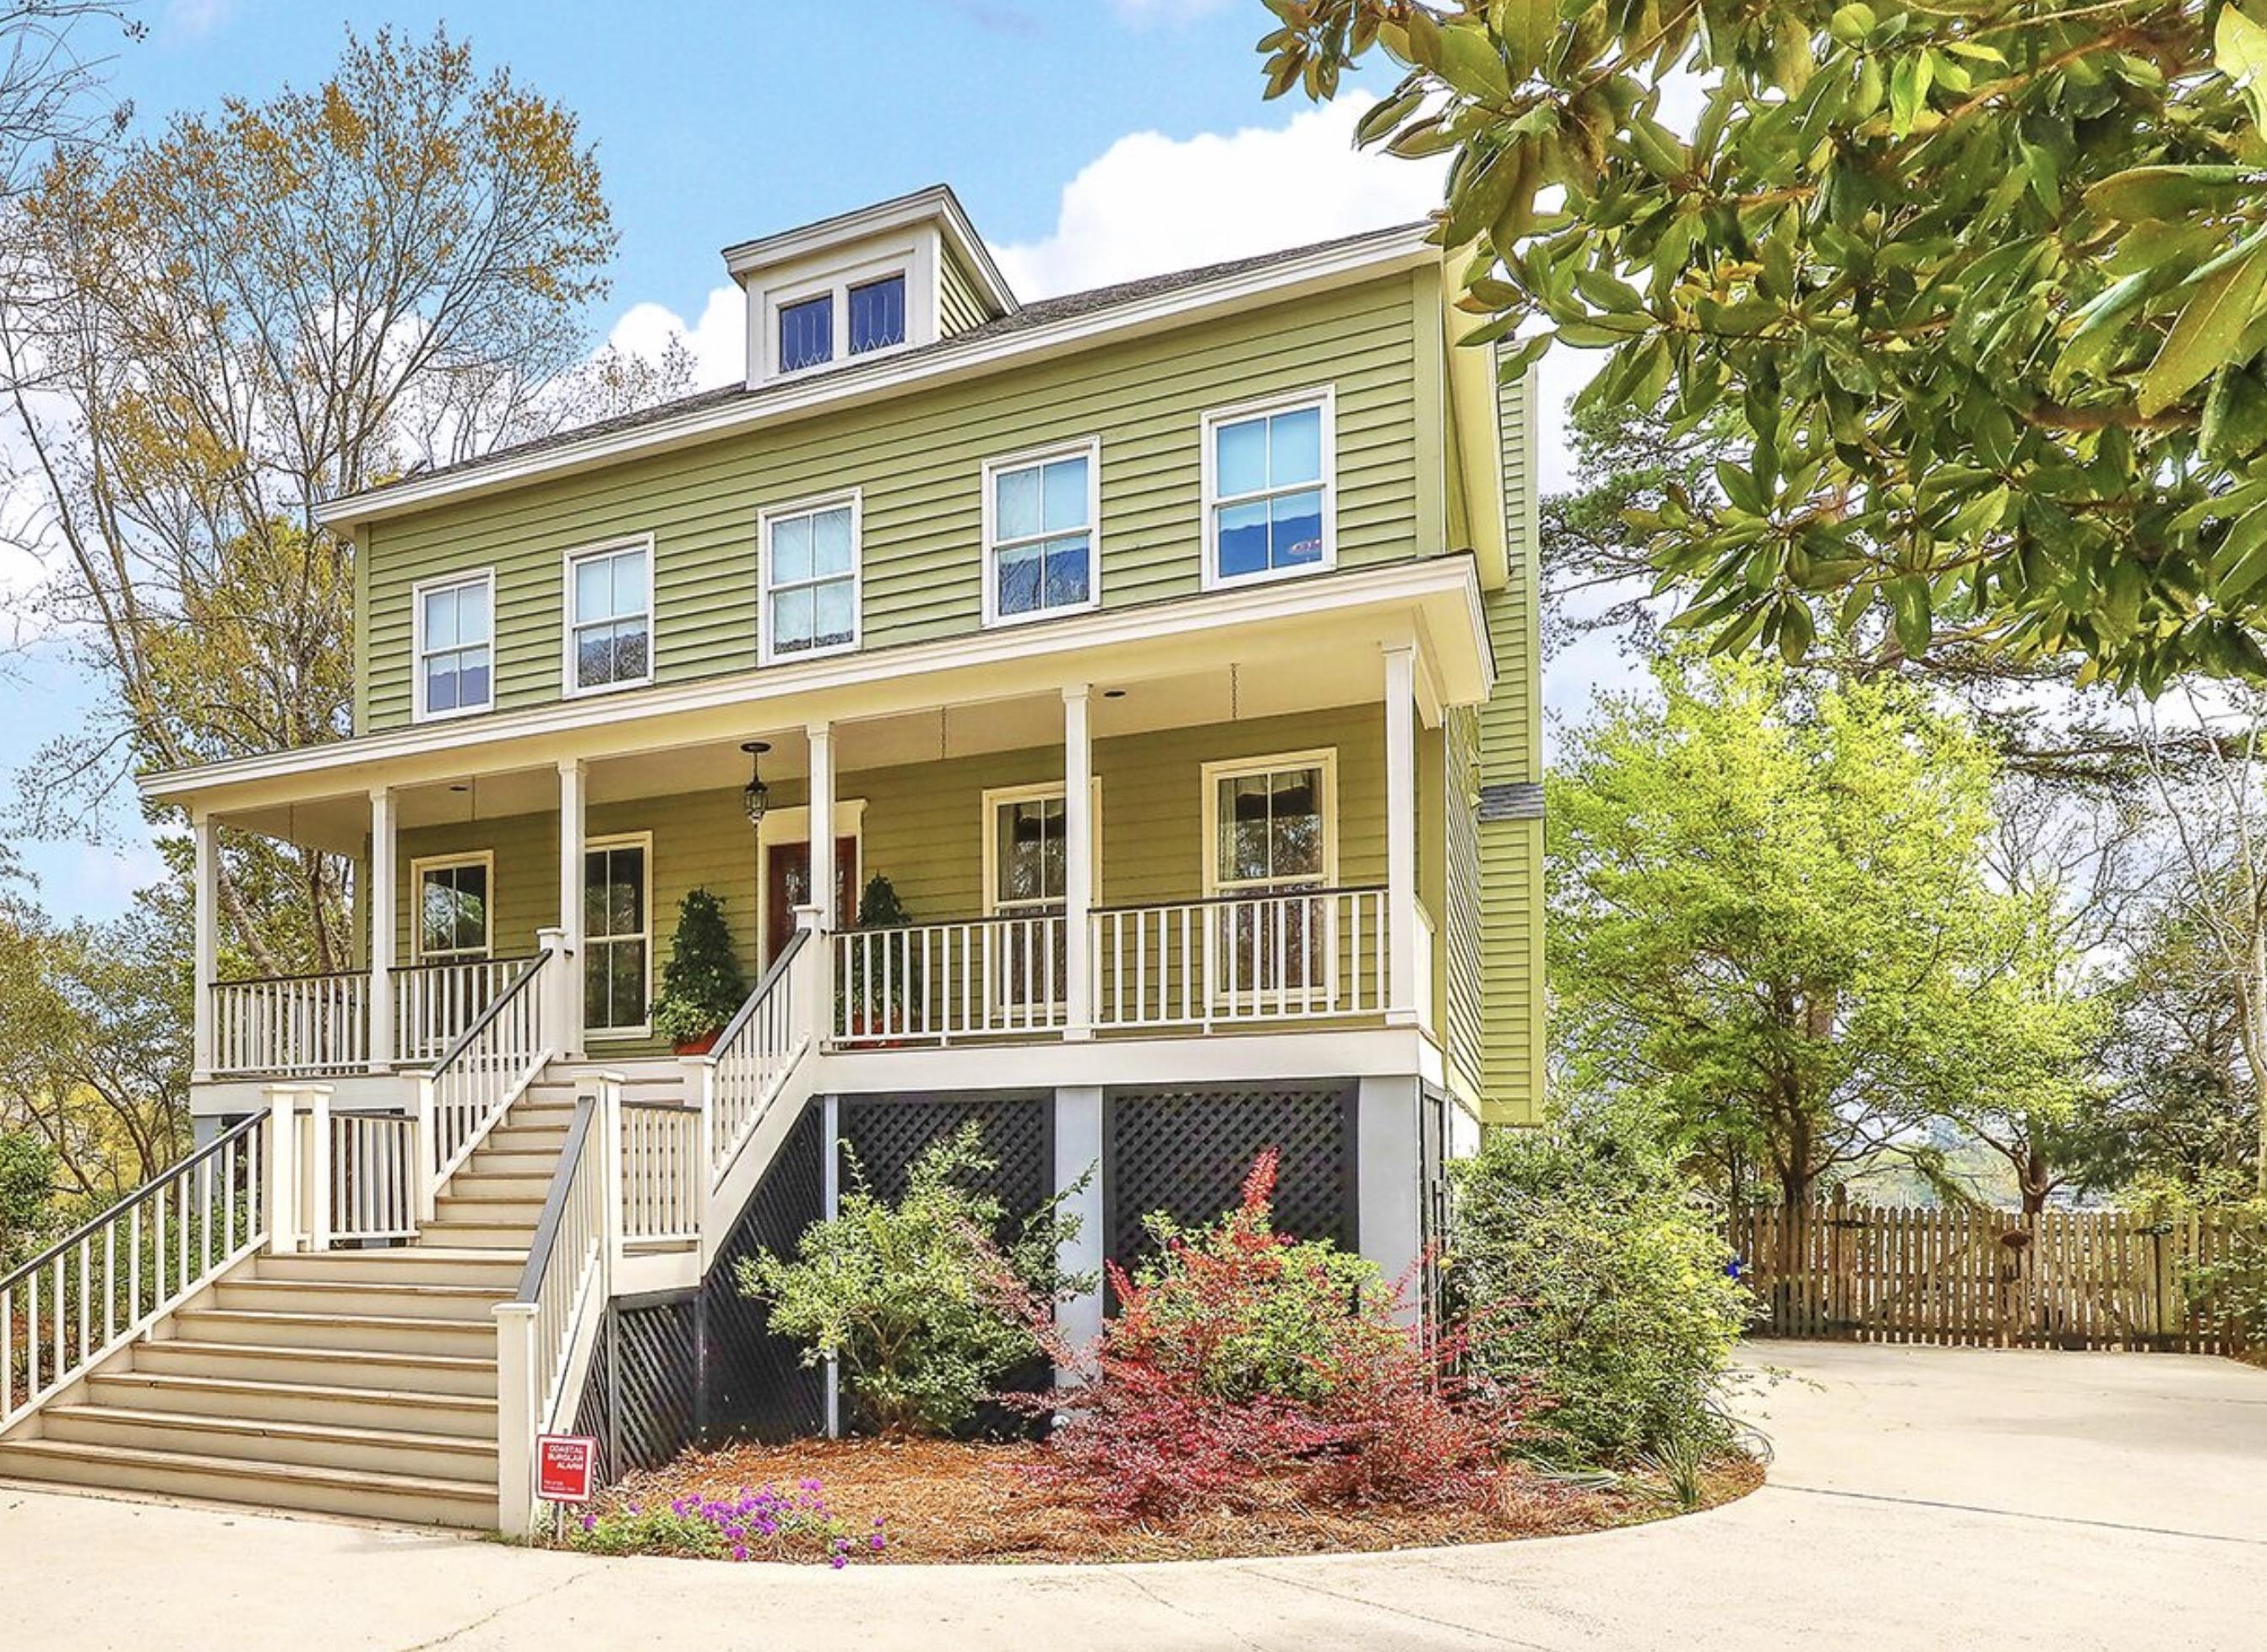 Hidden Cove Homes For Sale - 361 Anchor, Mount Pleasant, SC - 0